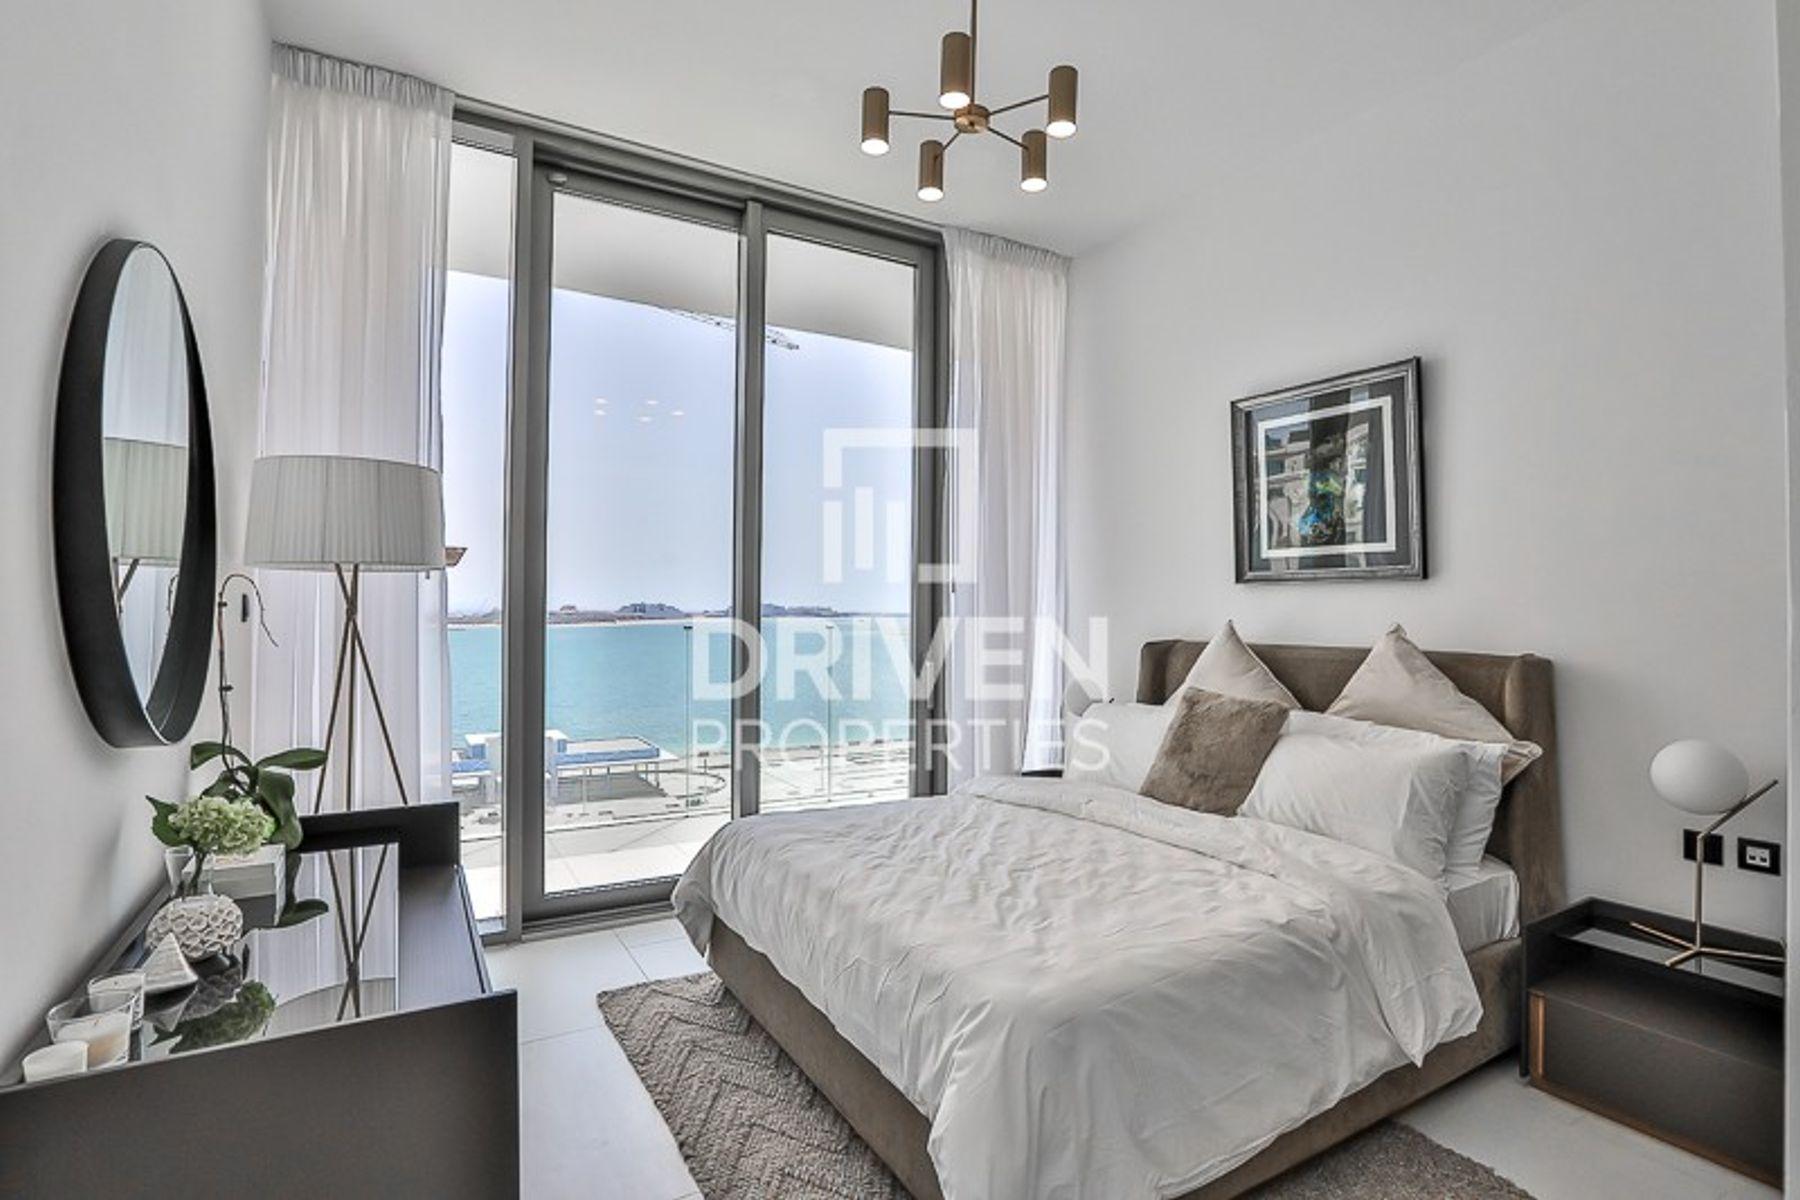 Penthouse for Rent in Soho Palm Jumeirah - Palm Jumeirah